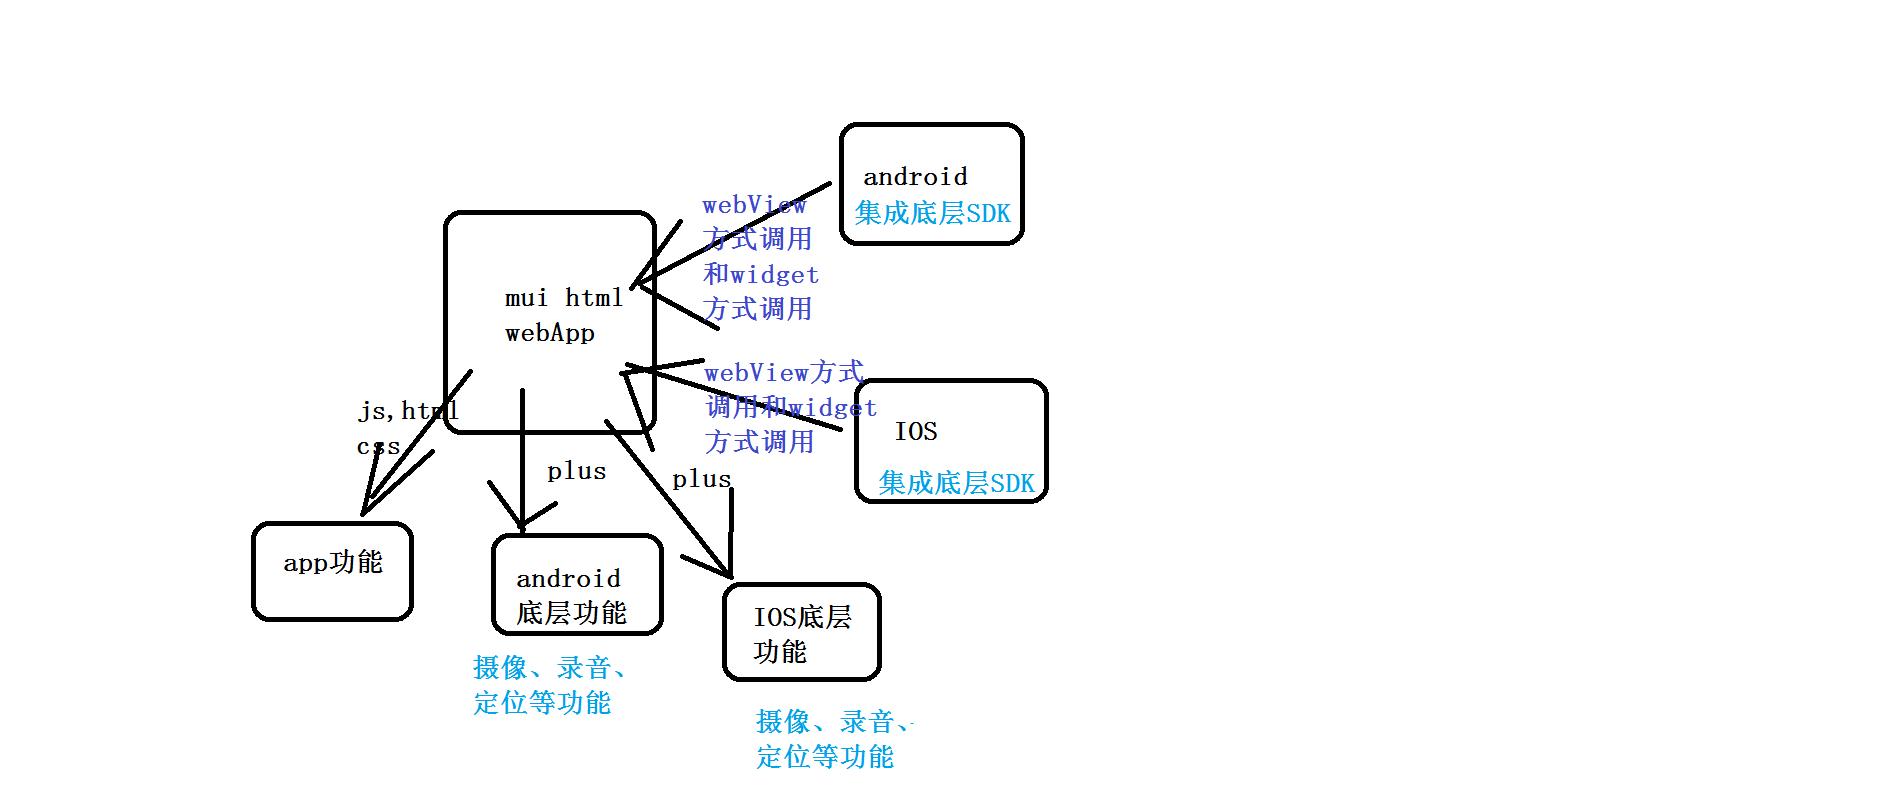 Android integrates Dcloud h5+SDK in a widget way